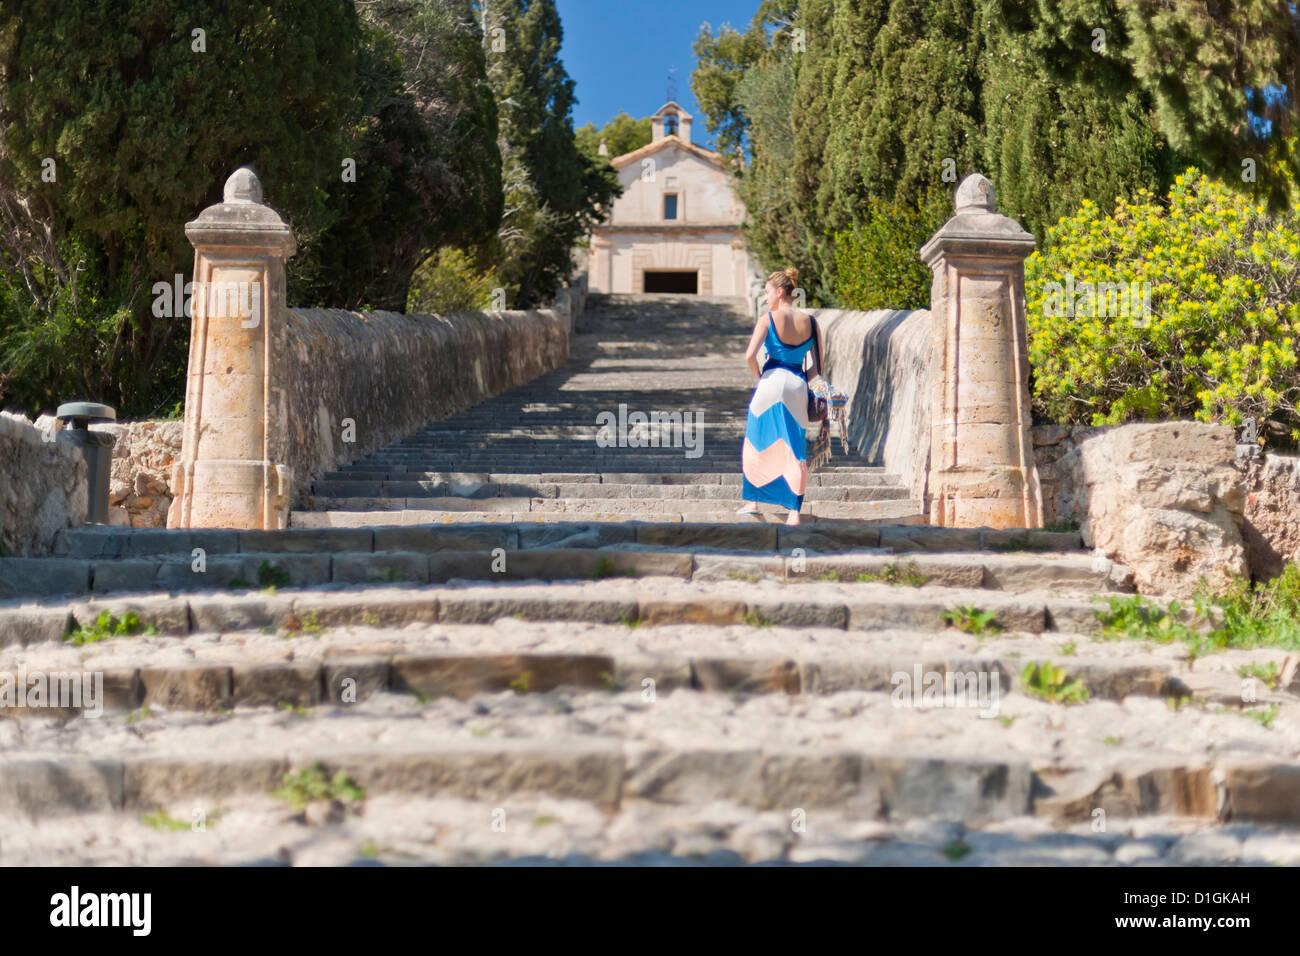 Famous 365-step stairway to the chapel Calvari, Pollenca, Tramuntana, Mallorca, Balearic Islands, Spain, Europe - Stock Image